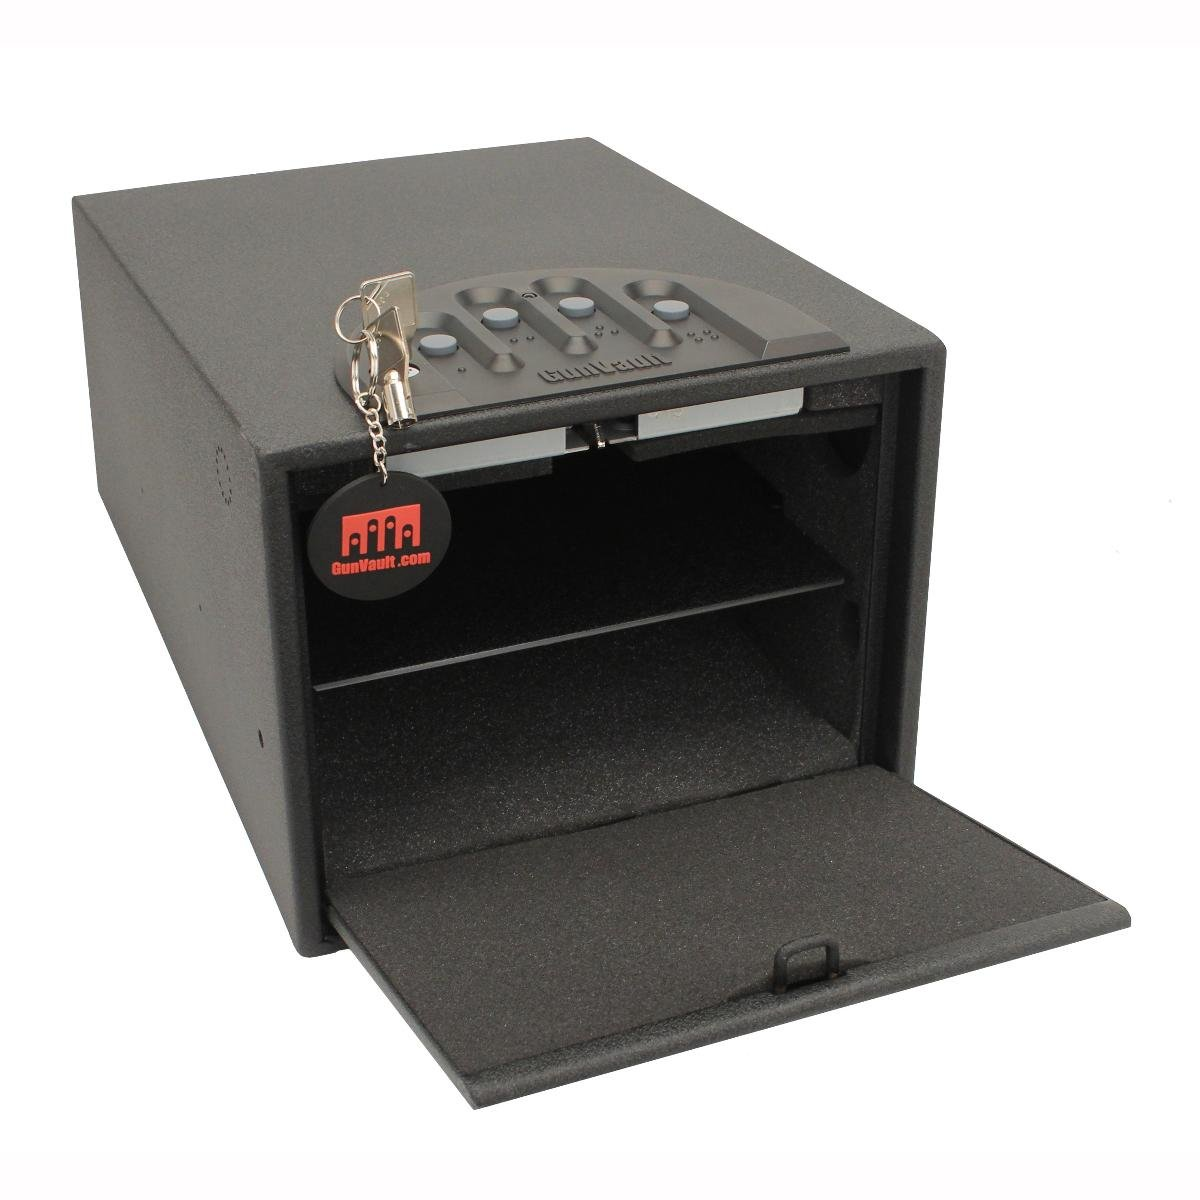 Amazon.com: Gunvault GV2000S Multi Vault Standard Gun Safe: Home ...